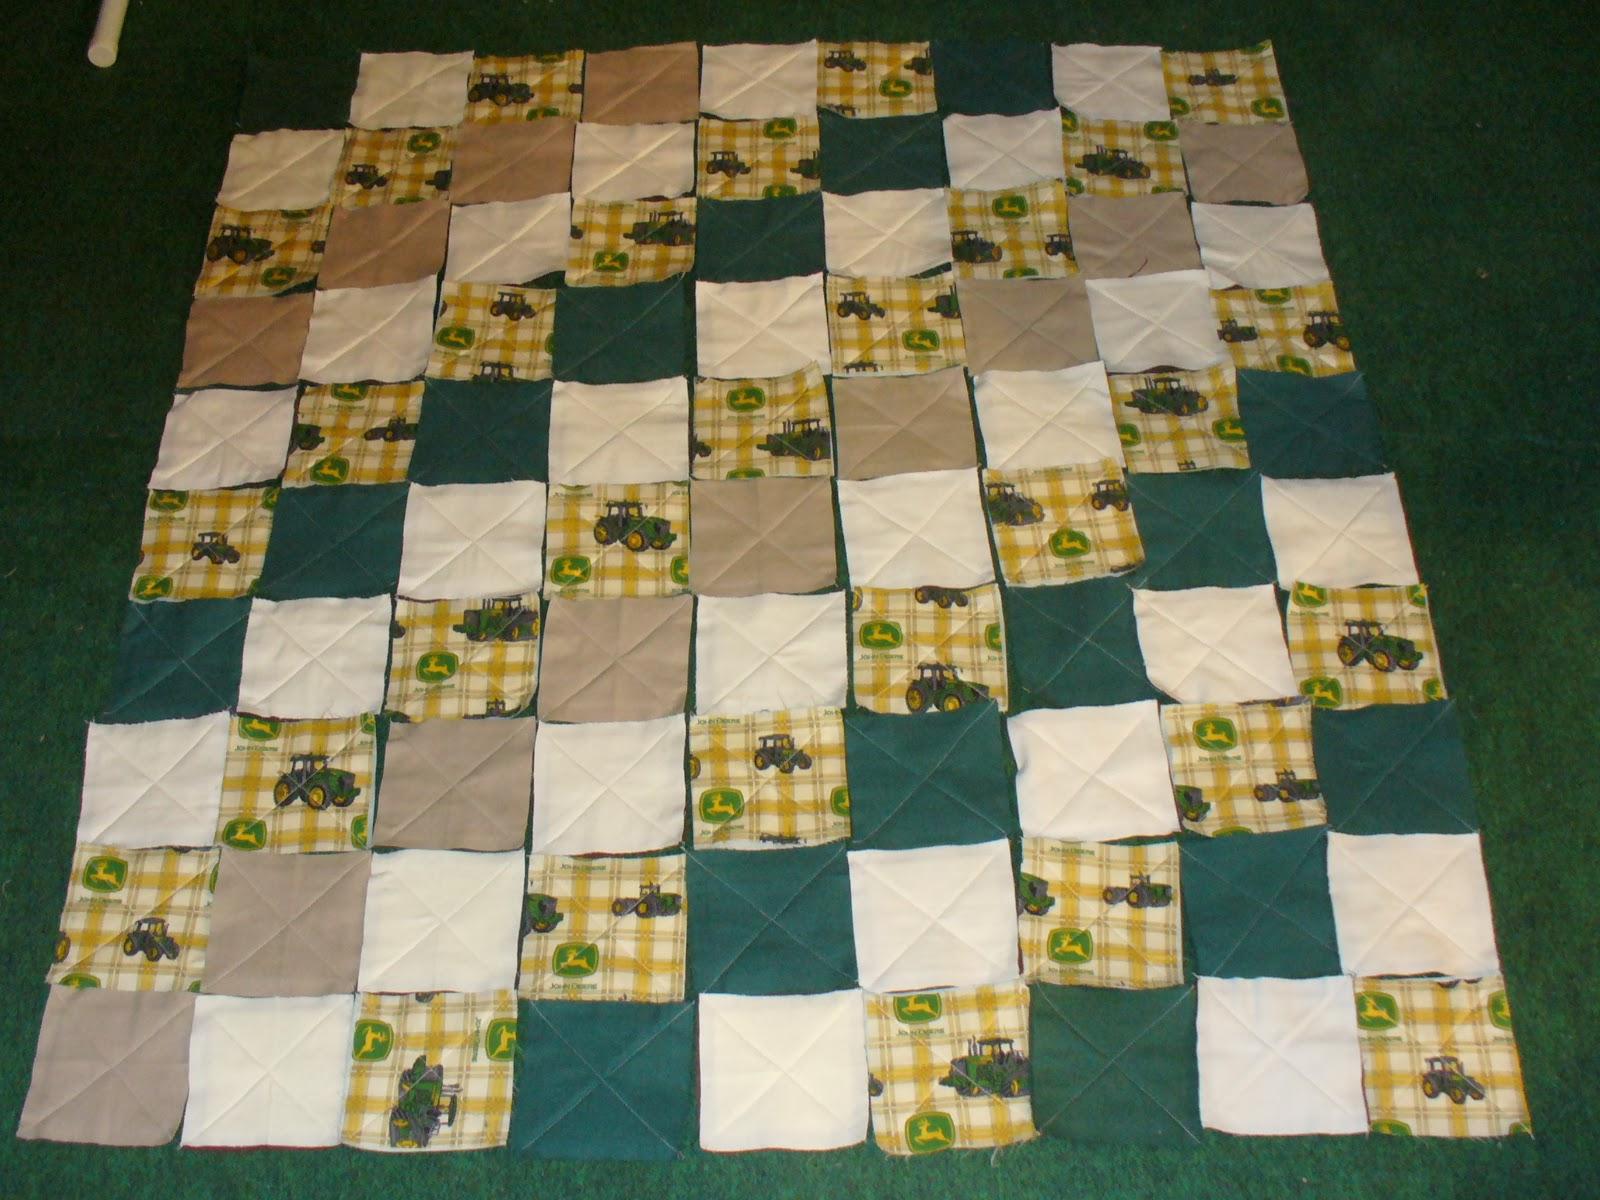 Ashlawnfarms Rag Quilt Creations: John Deere Rag Quilt : john deere quilts - Adamdwight.com